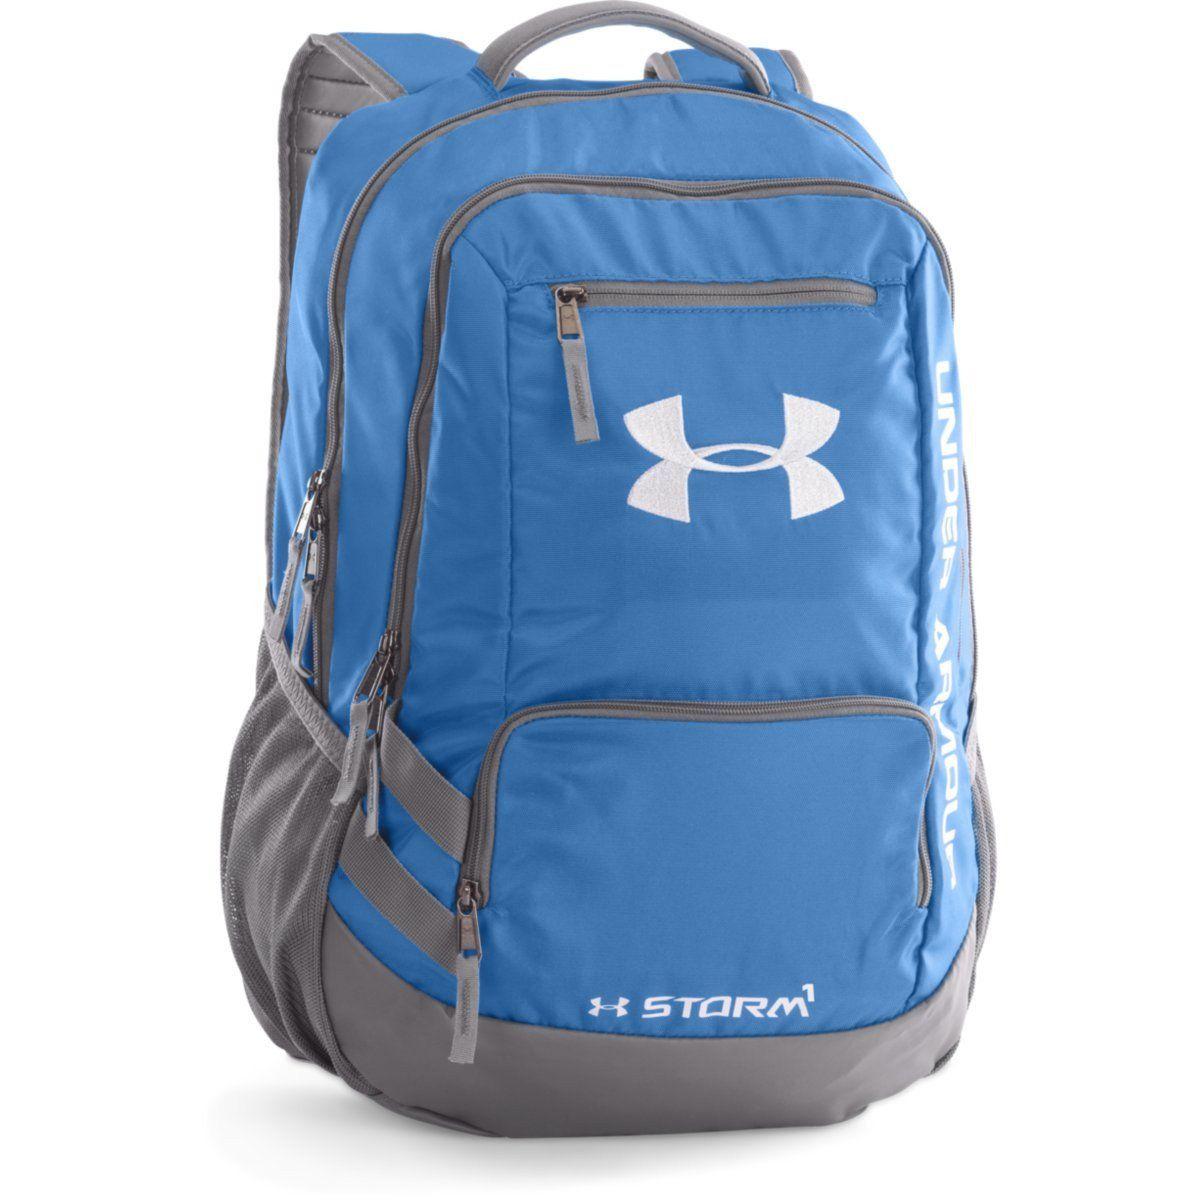 Under Armour Carolina Blue Black UA Hustle II Backpack   Products ... 66bce645be